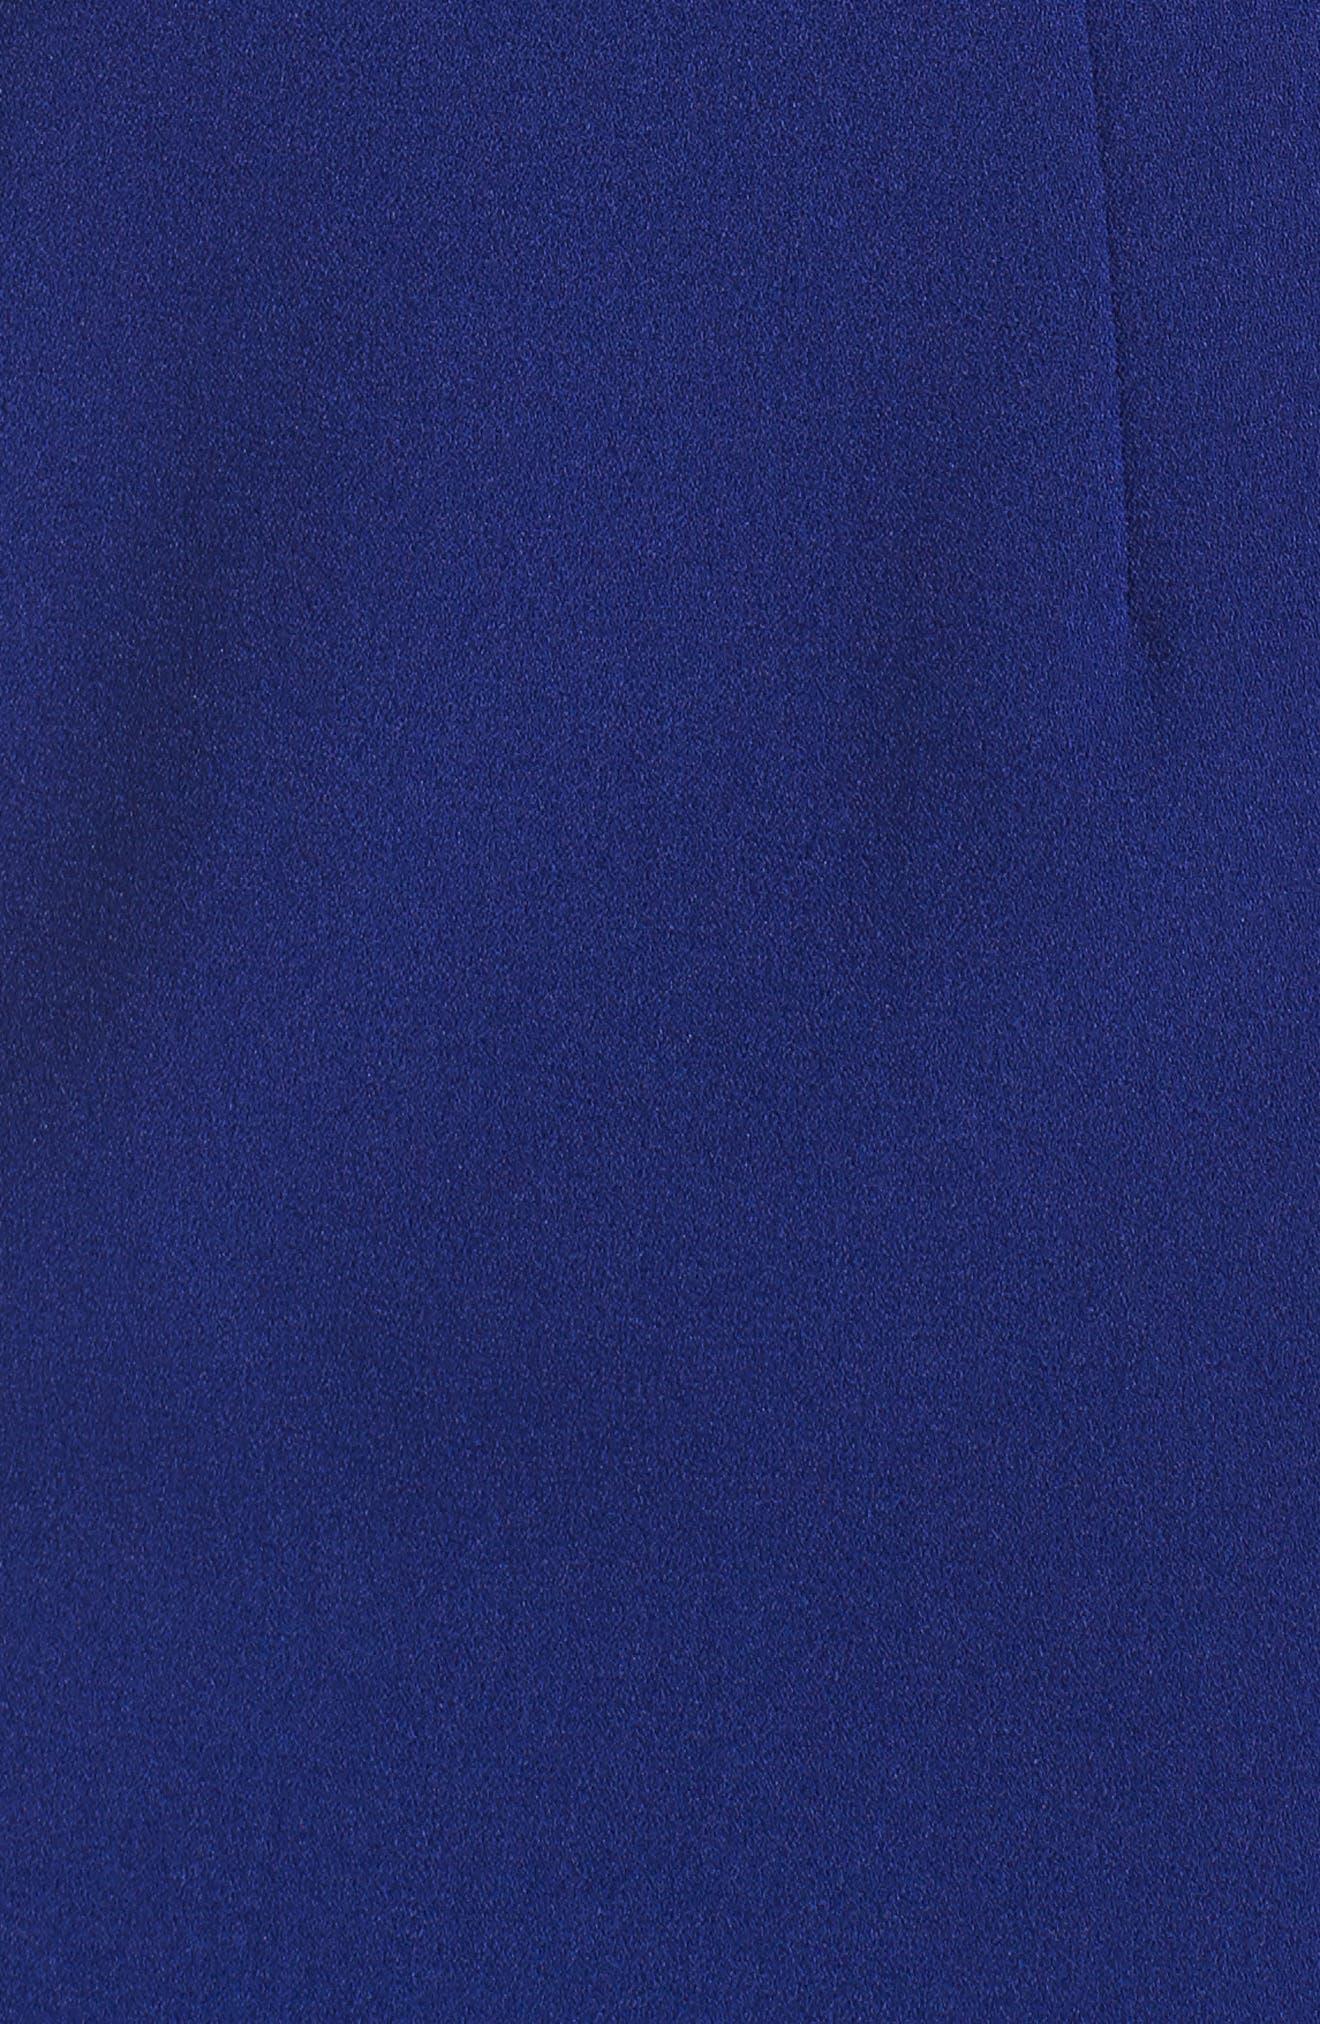 One-Shoulder Crepe Sheath Dress,                             Alternate thumbnail 5, color,                             Blue Cobalt